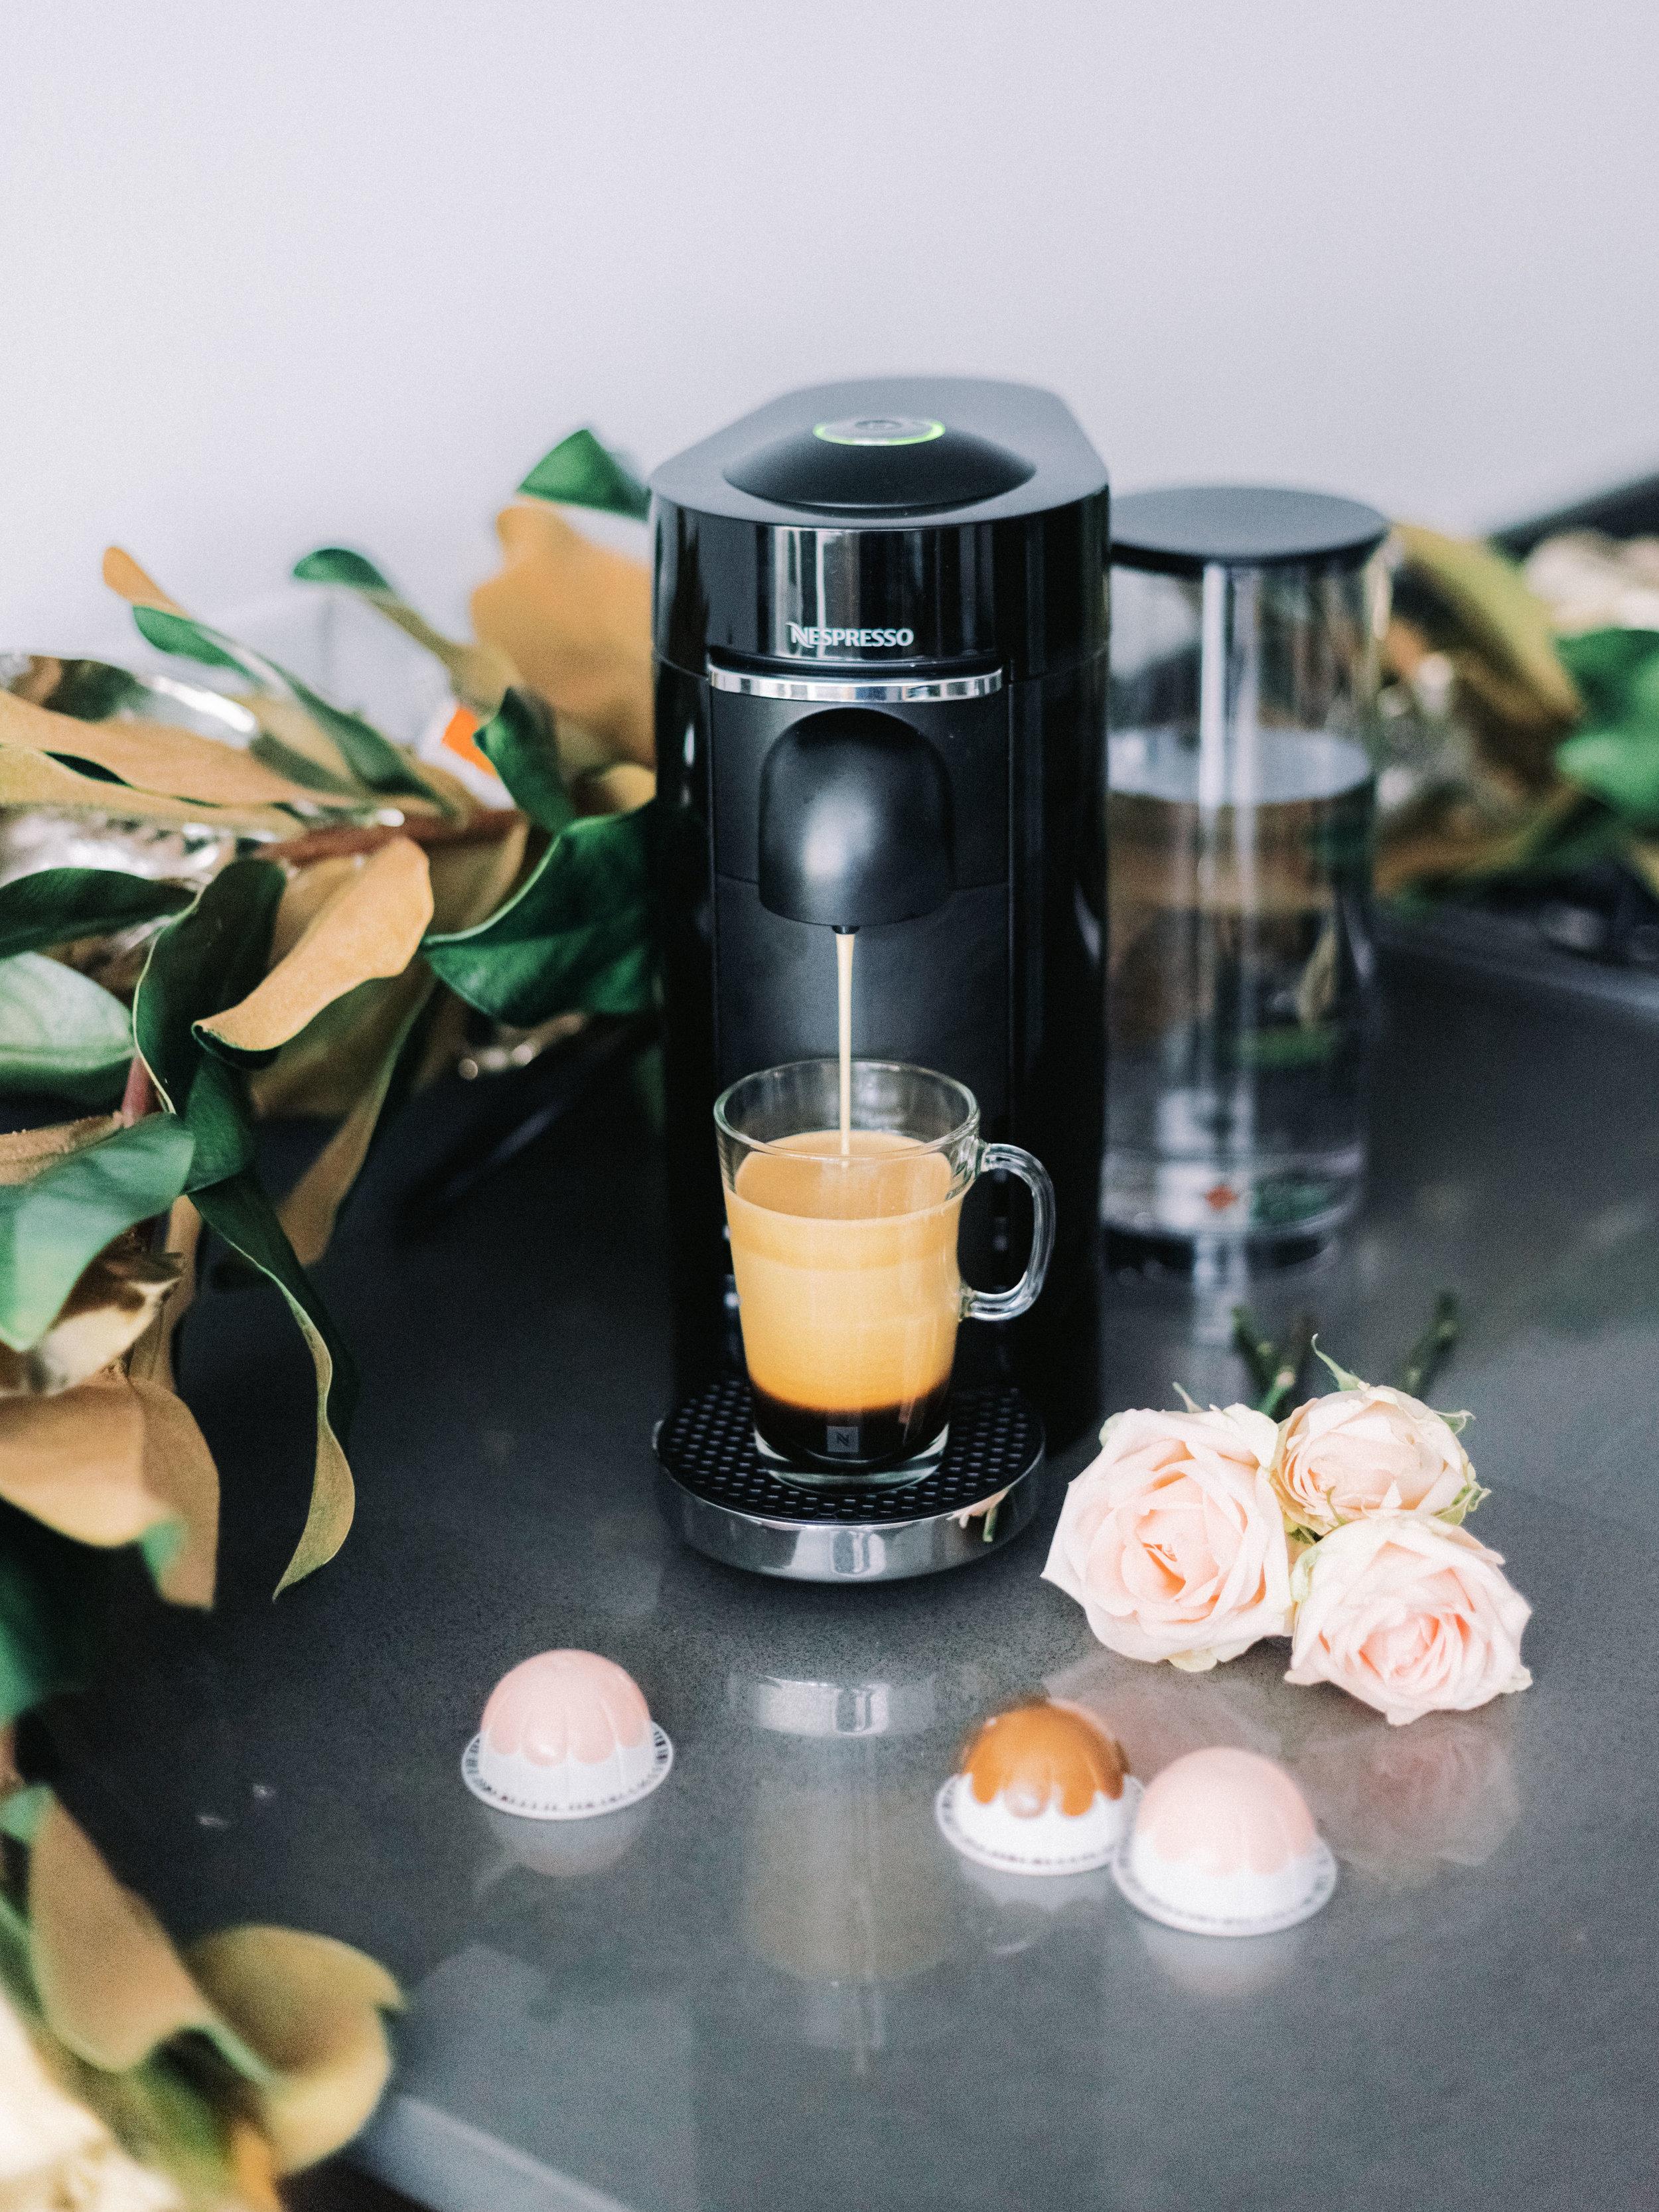 The Bachelor Caila Quinn and Sharleen Joynt enjoying Nespresso Coffee Machine a premium holiday gift in their New York City Kitchen